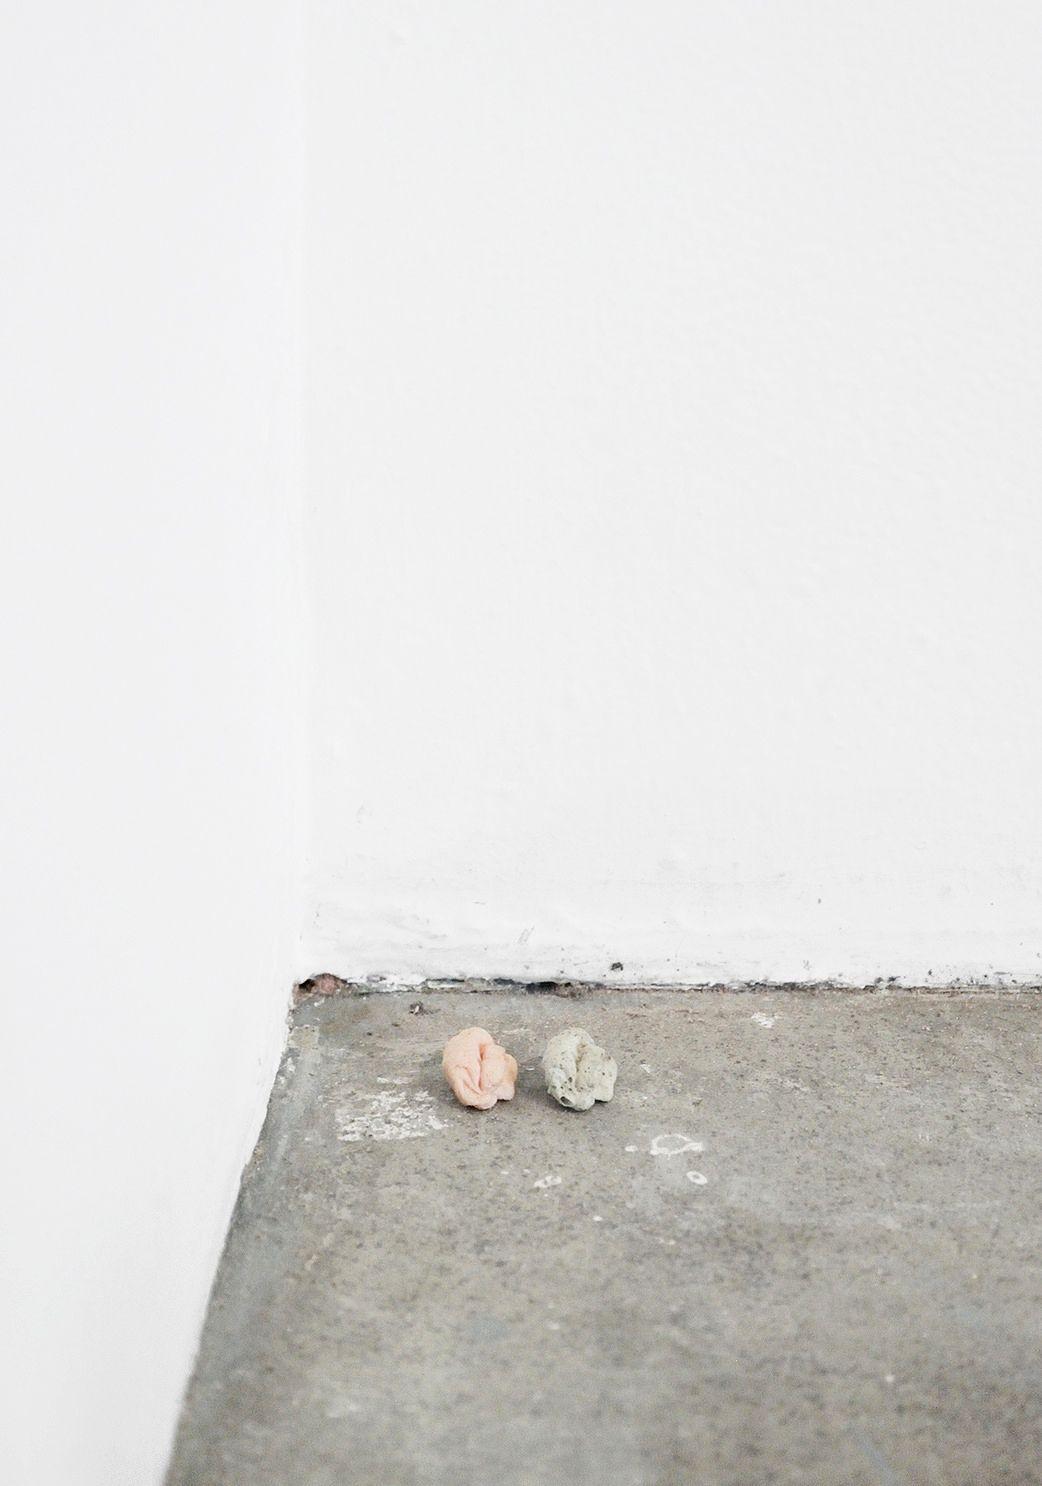 Nina Canell, {ITALIC}Remembrance (Colourless){ENDITALIC}, 2013.